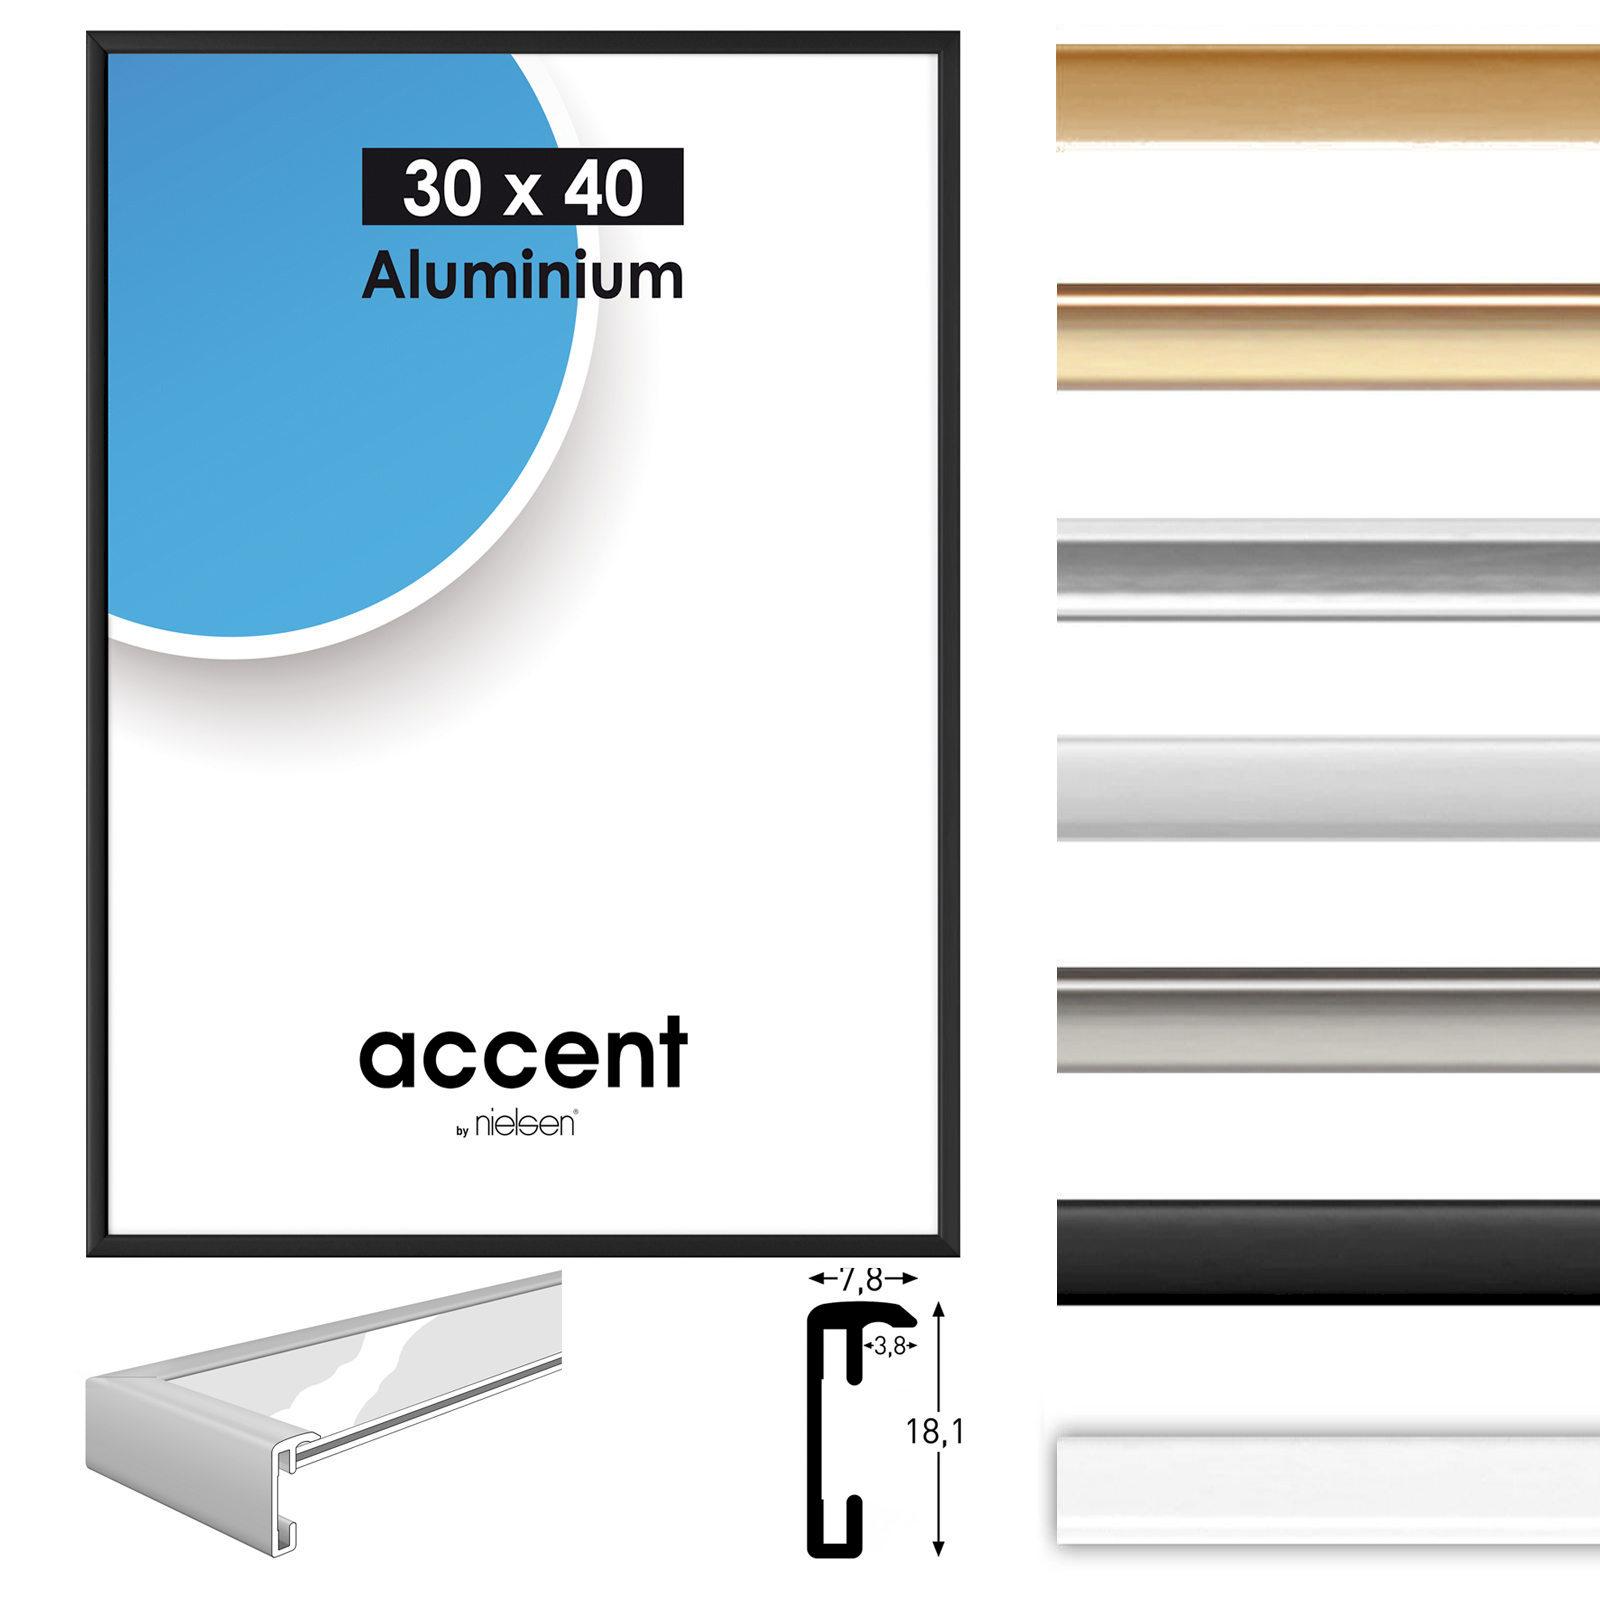 alurahmen accent wechselrahmen alu bilderrahmen alu 7. Black Bedroom Furniture Sets. Home Design Ideas